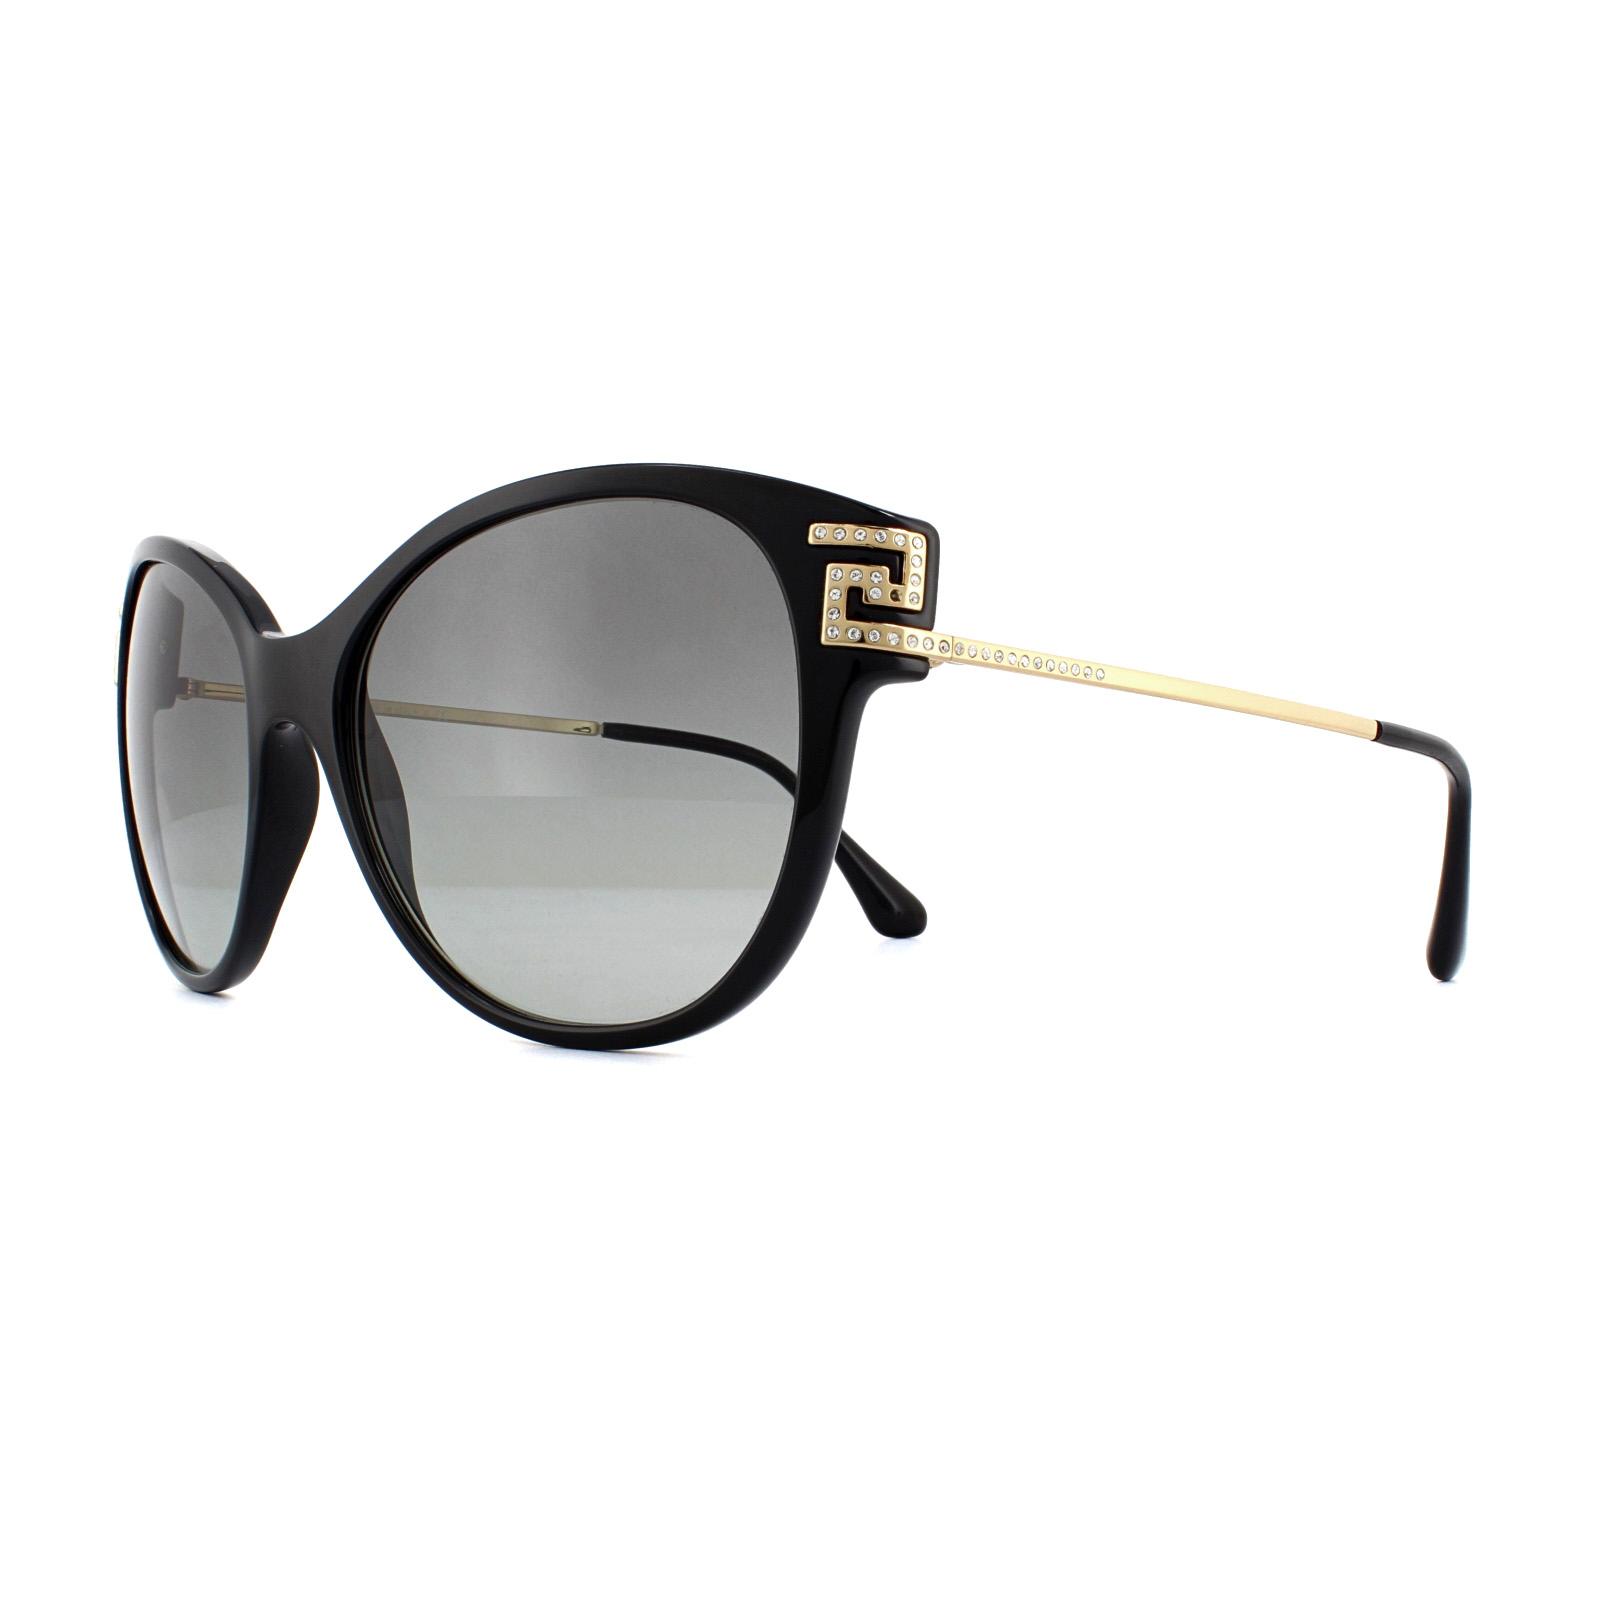 d7476ef8172 Sentinel Versace Sunglasses VE4316B GB1 11 Black Grey Gradient